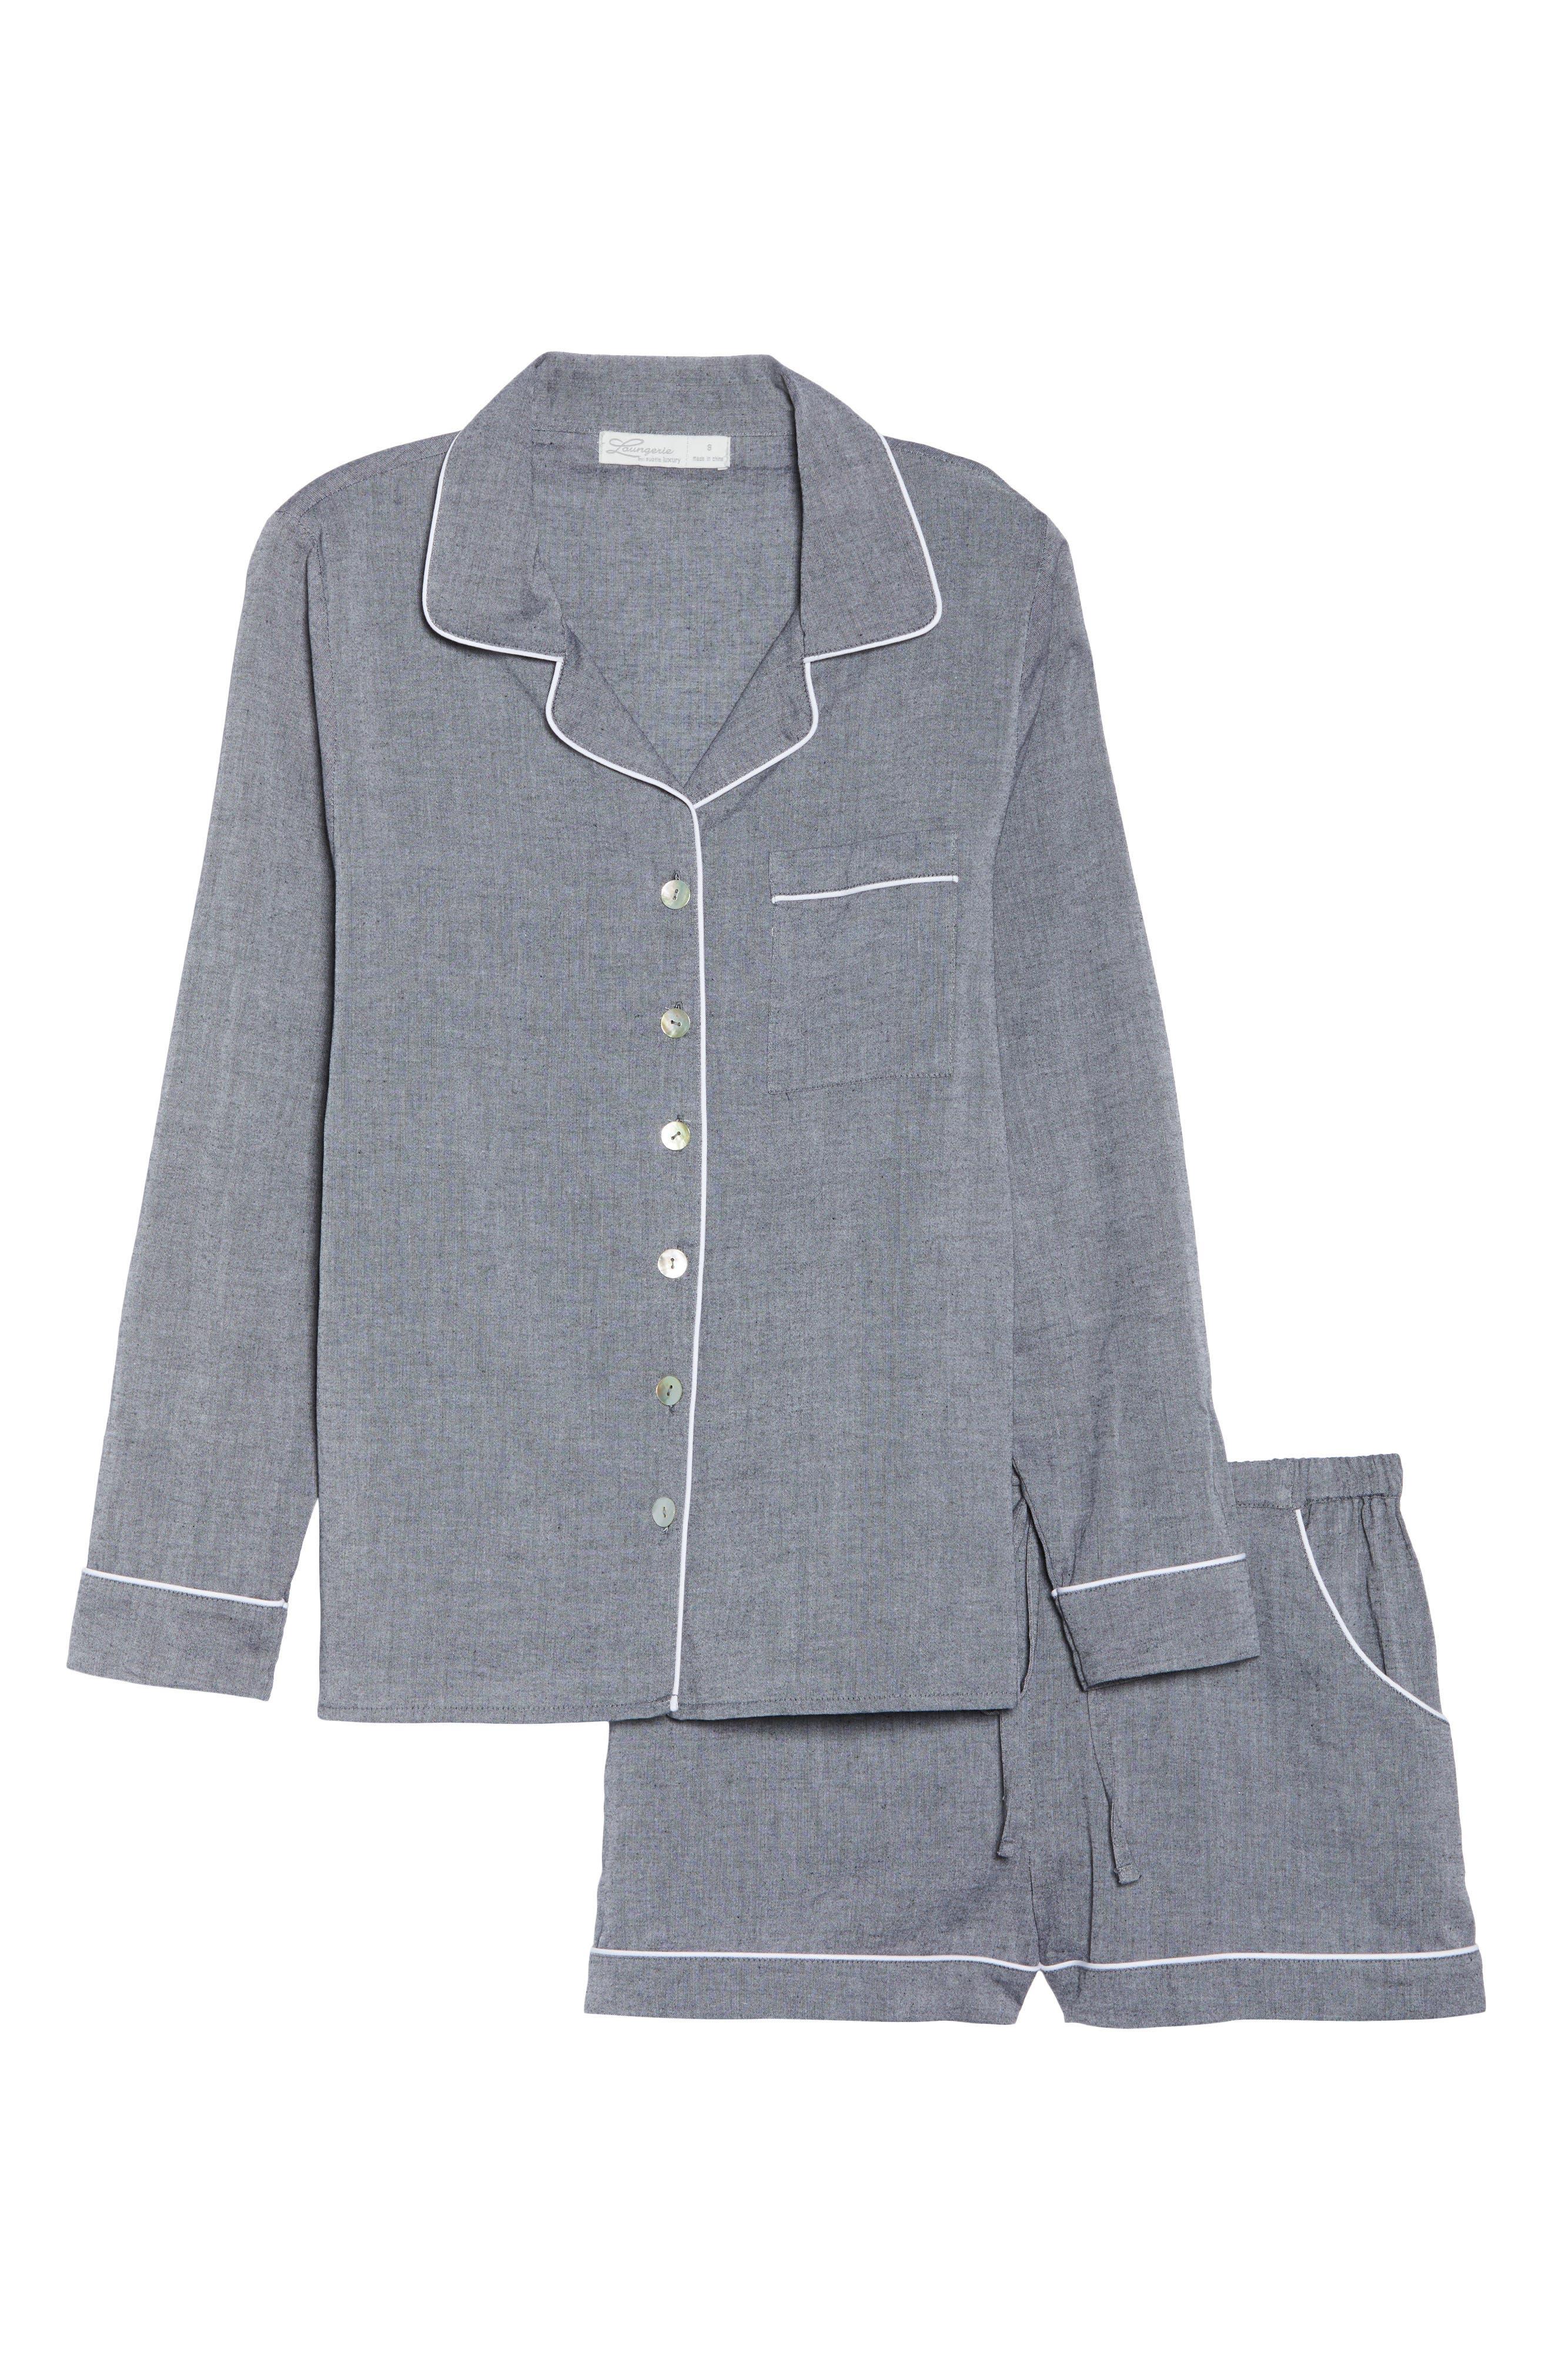 Short Pajamas,                             Alternate thumbnail 6, color,                             Charcoal